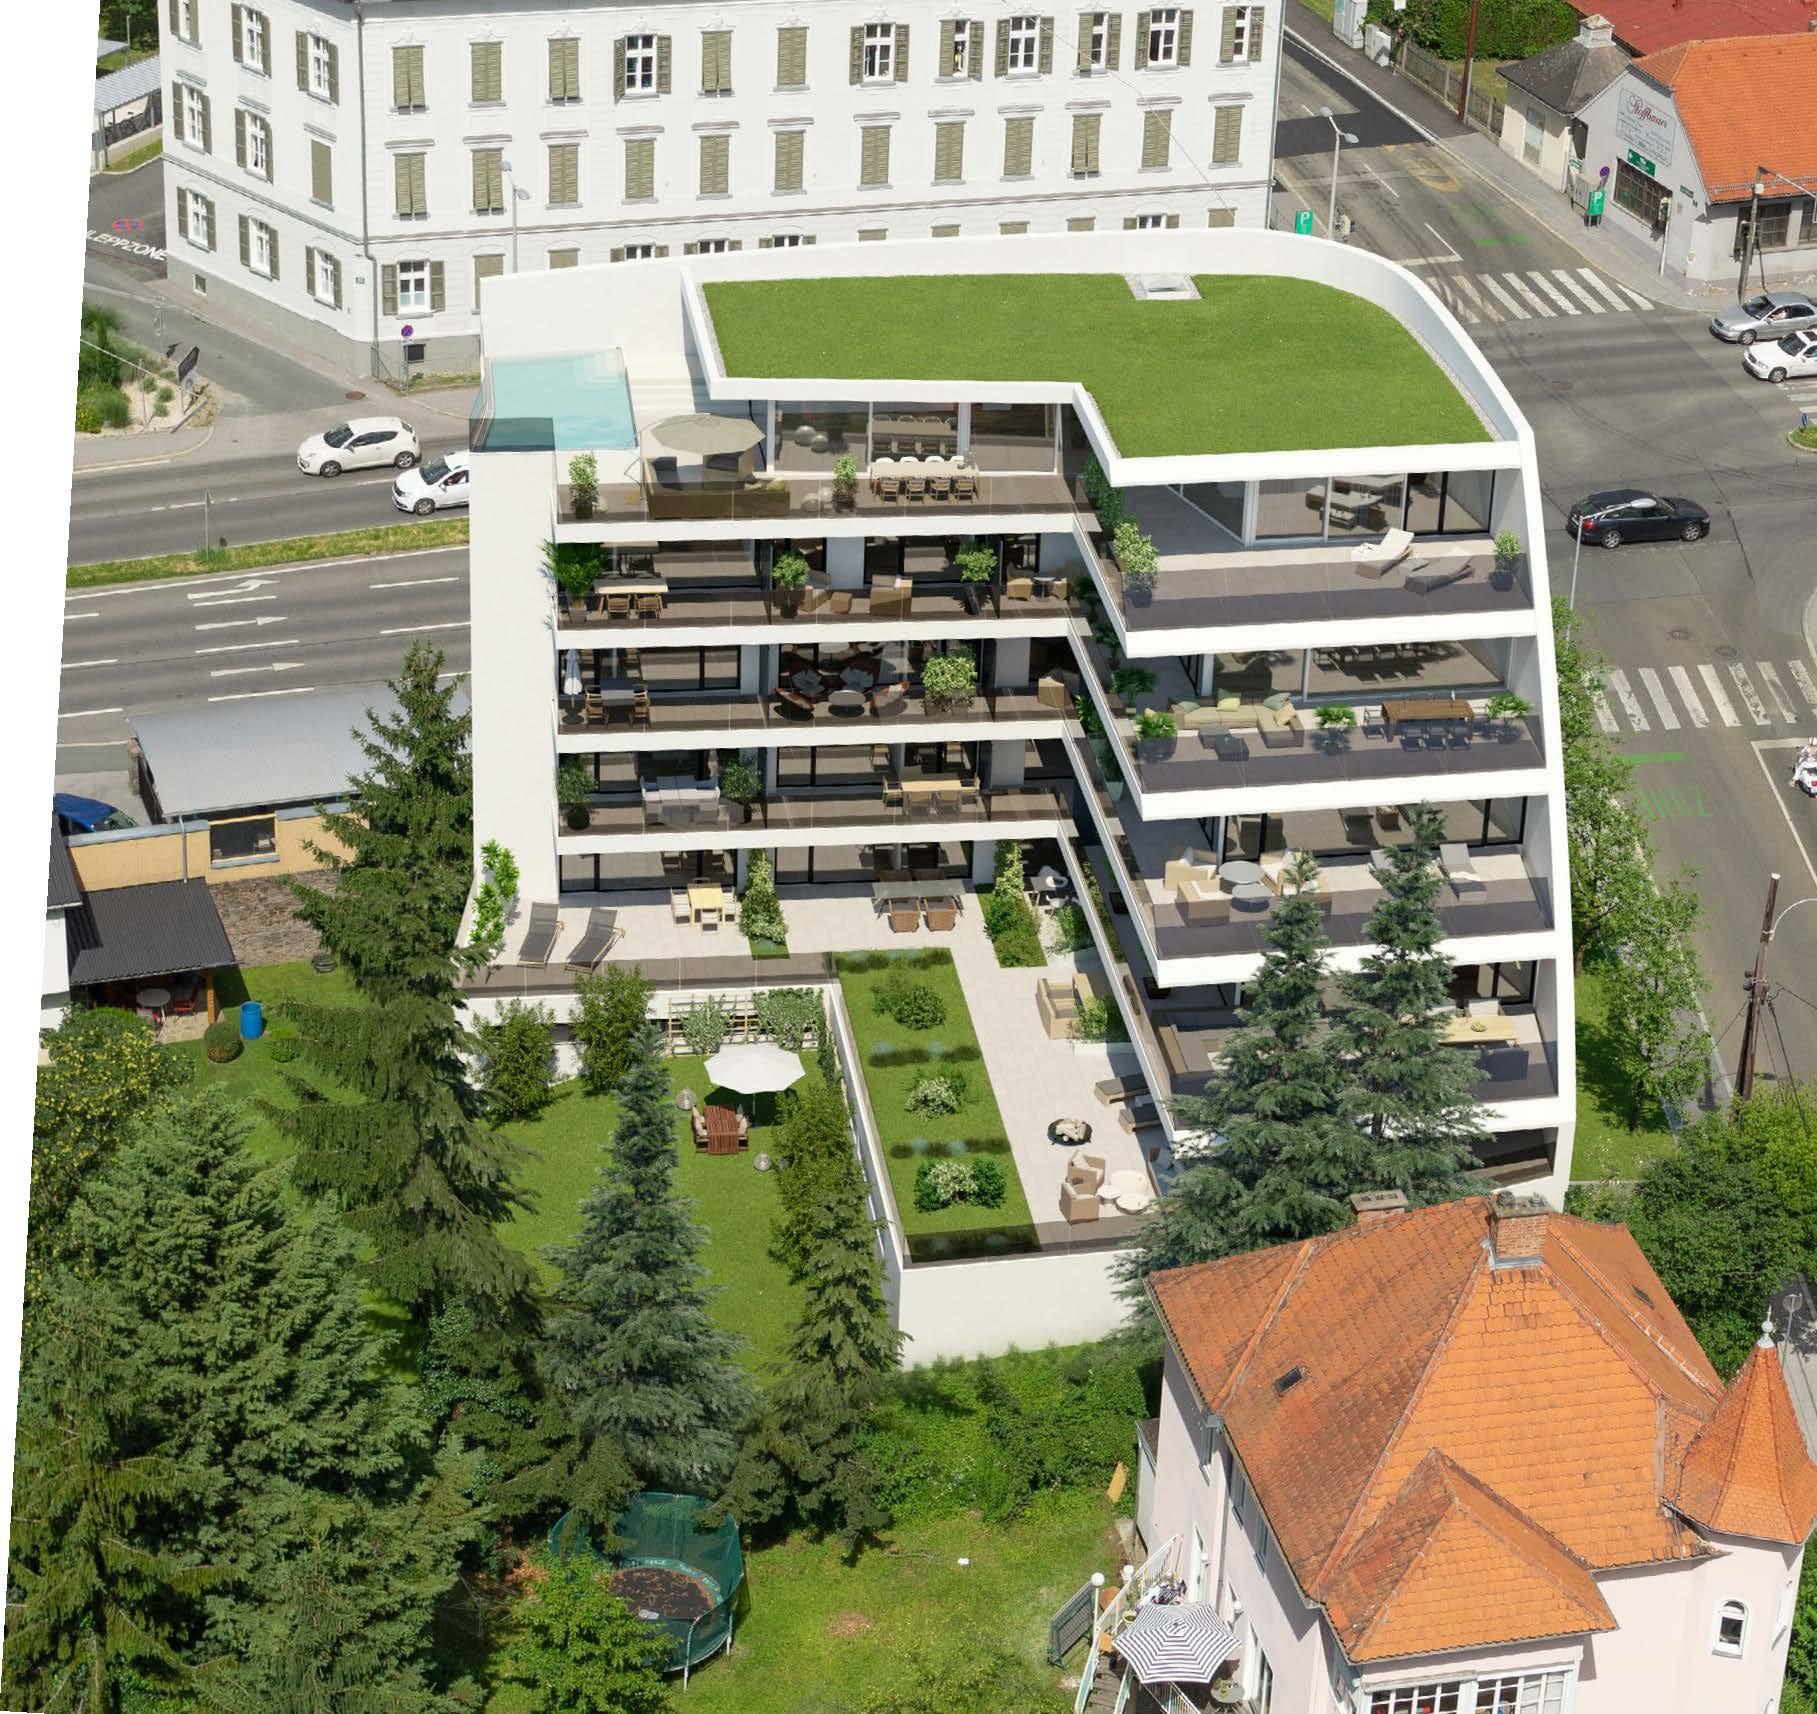 Geidorf_Living_Captura_Vorsorgewohnung_Graz_Geidorf6